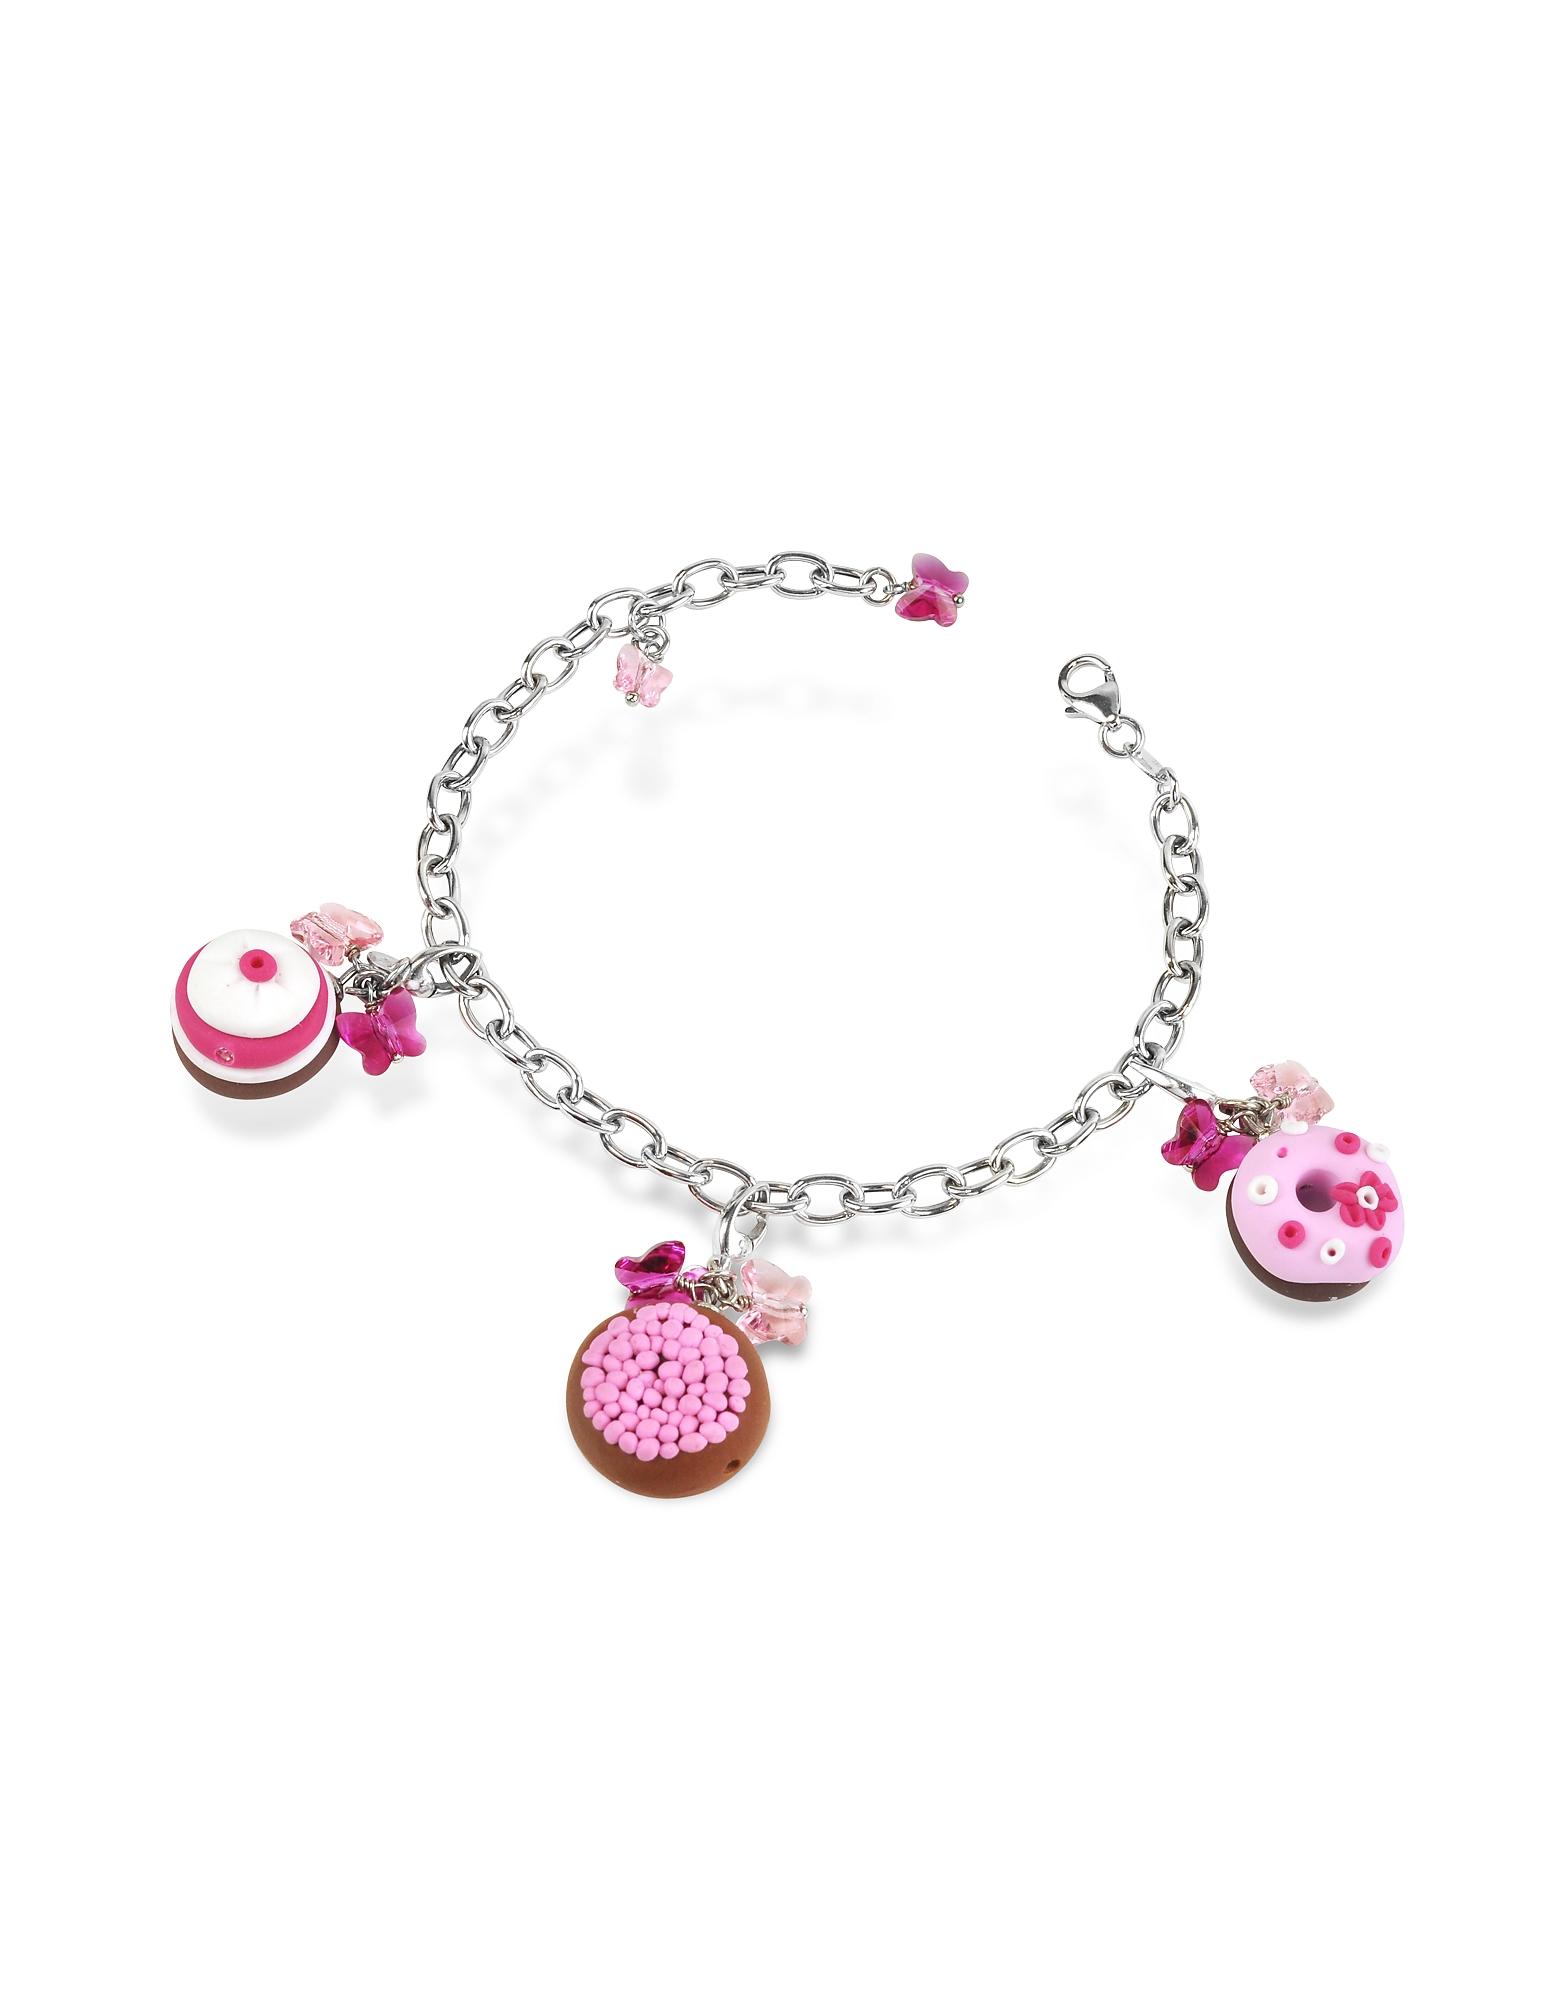 Dolci Gioie Bracelets, Sterling Silver Detachable Charm Bracelet